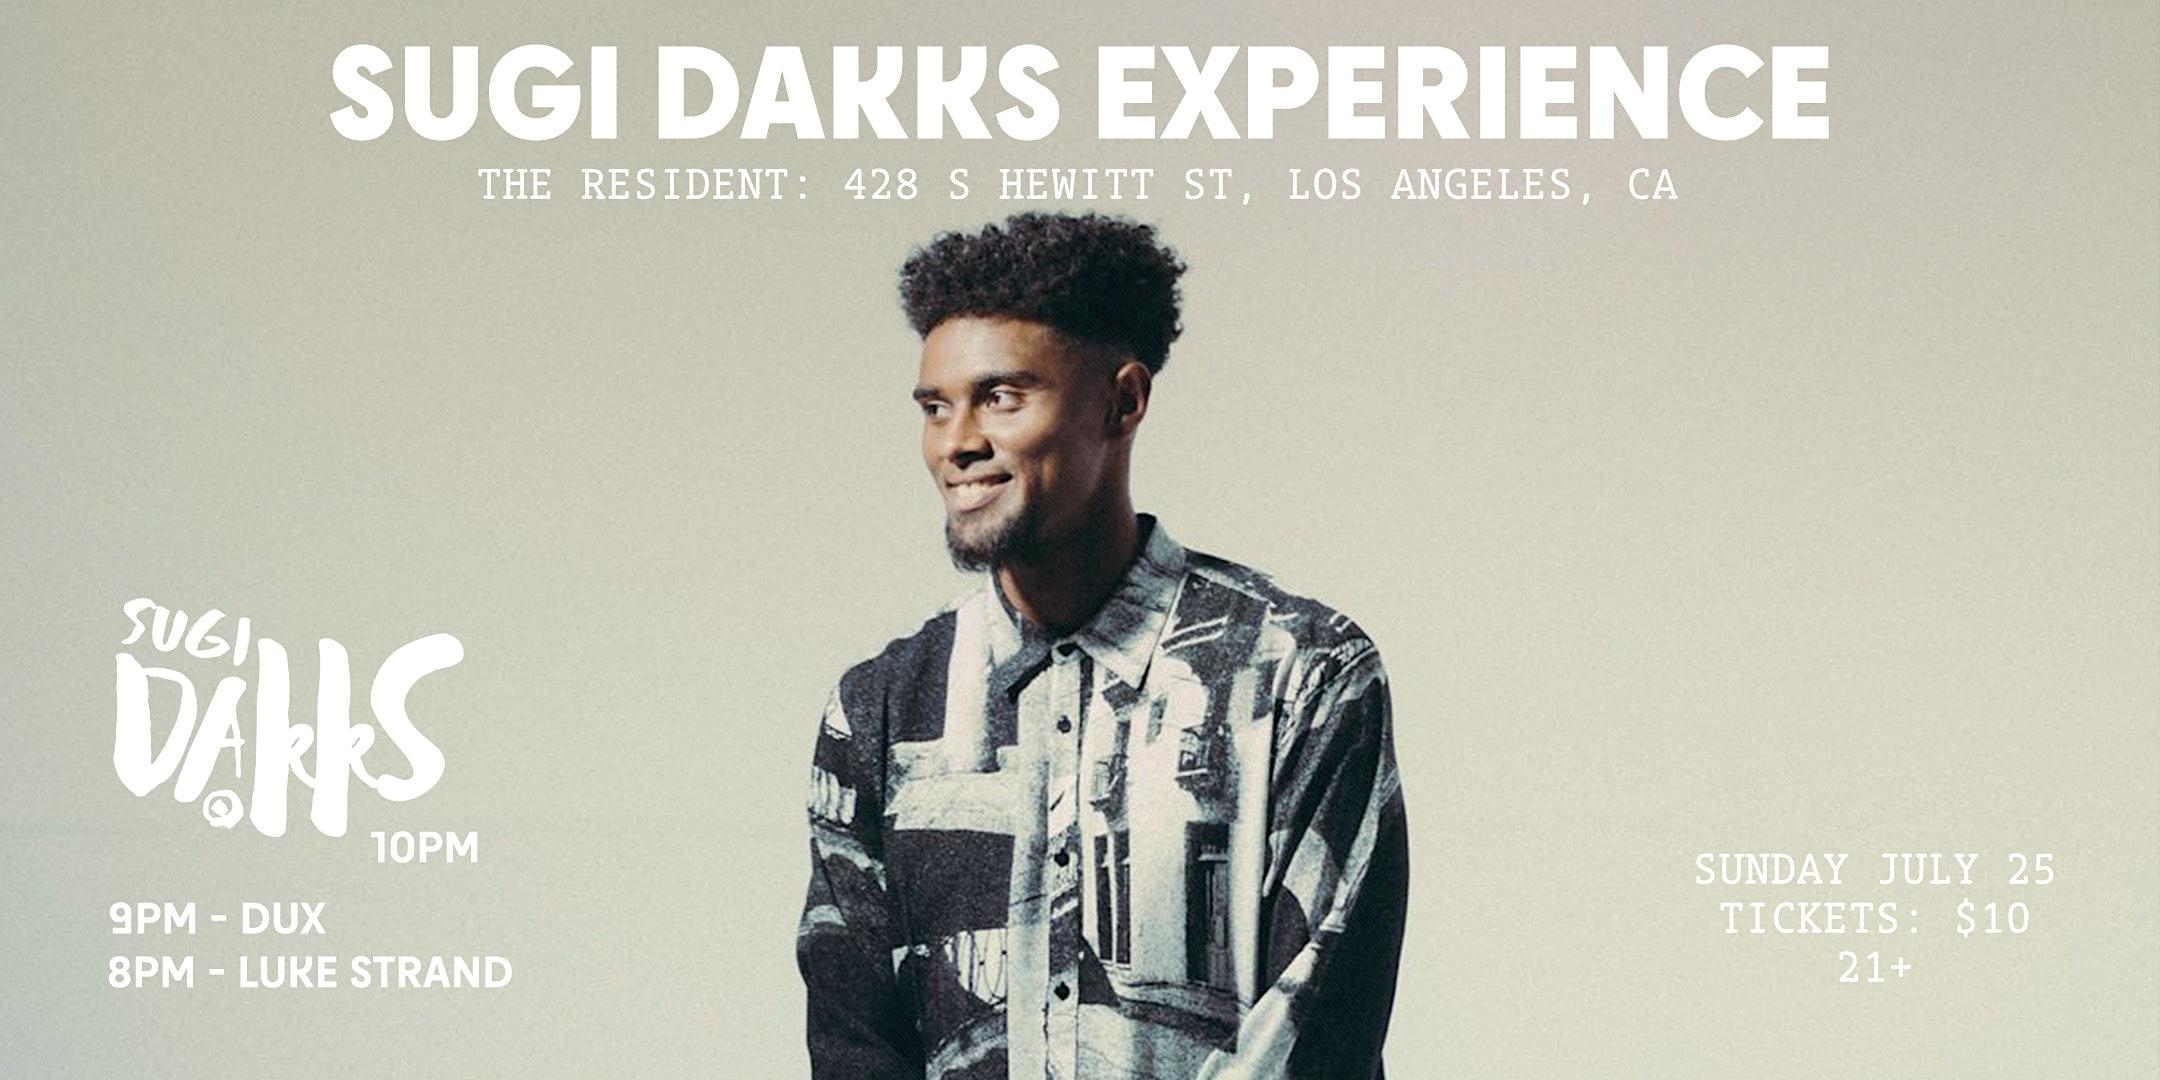 Sugi Dakks Experience